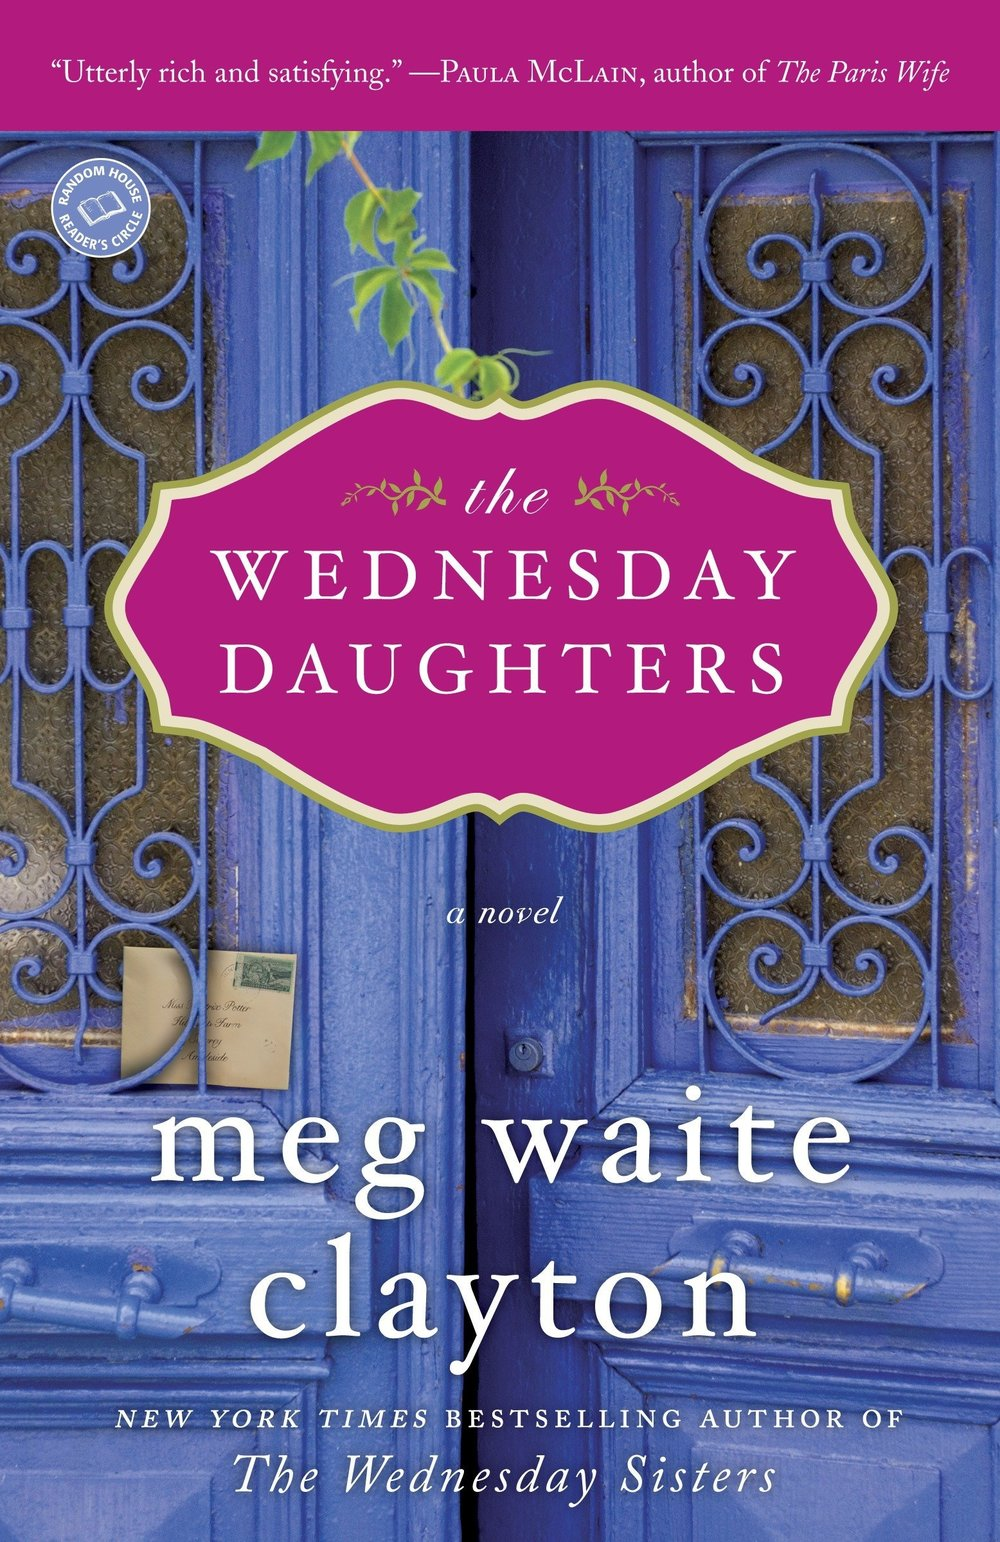 Wednesday Daughter.jpg